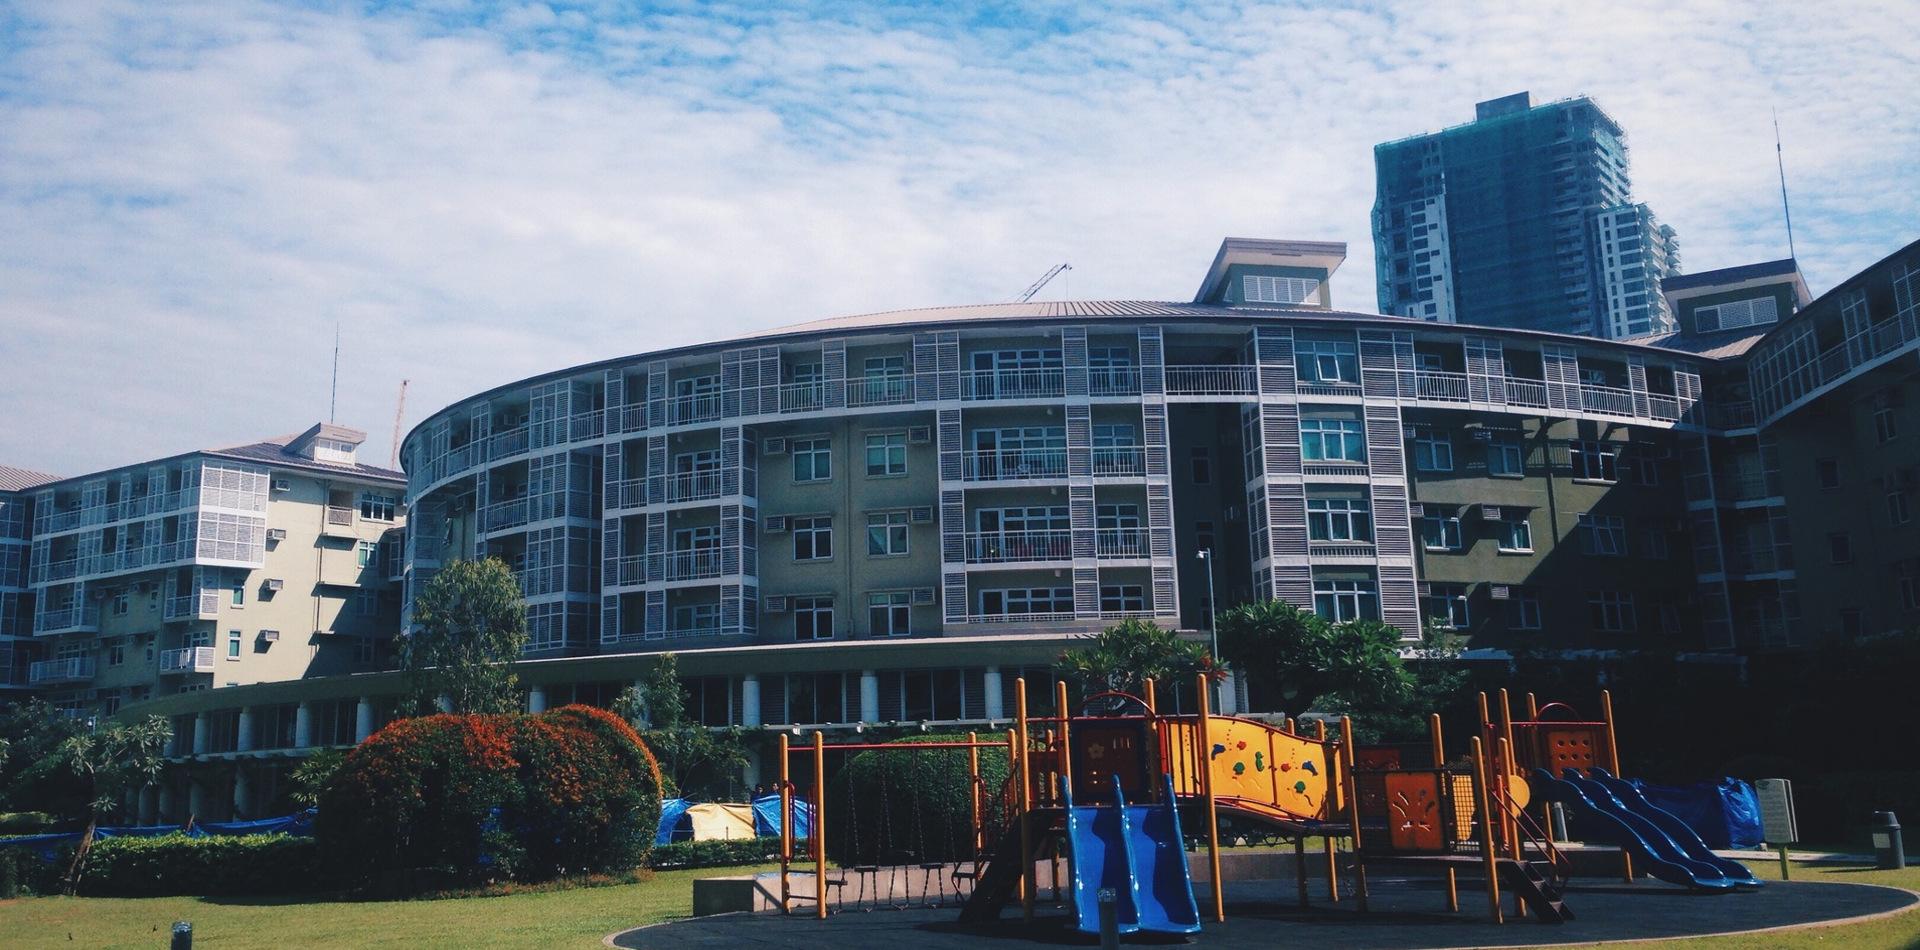 constructionwebsitethem